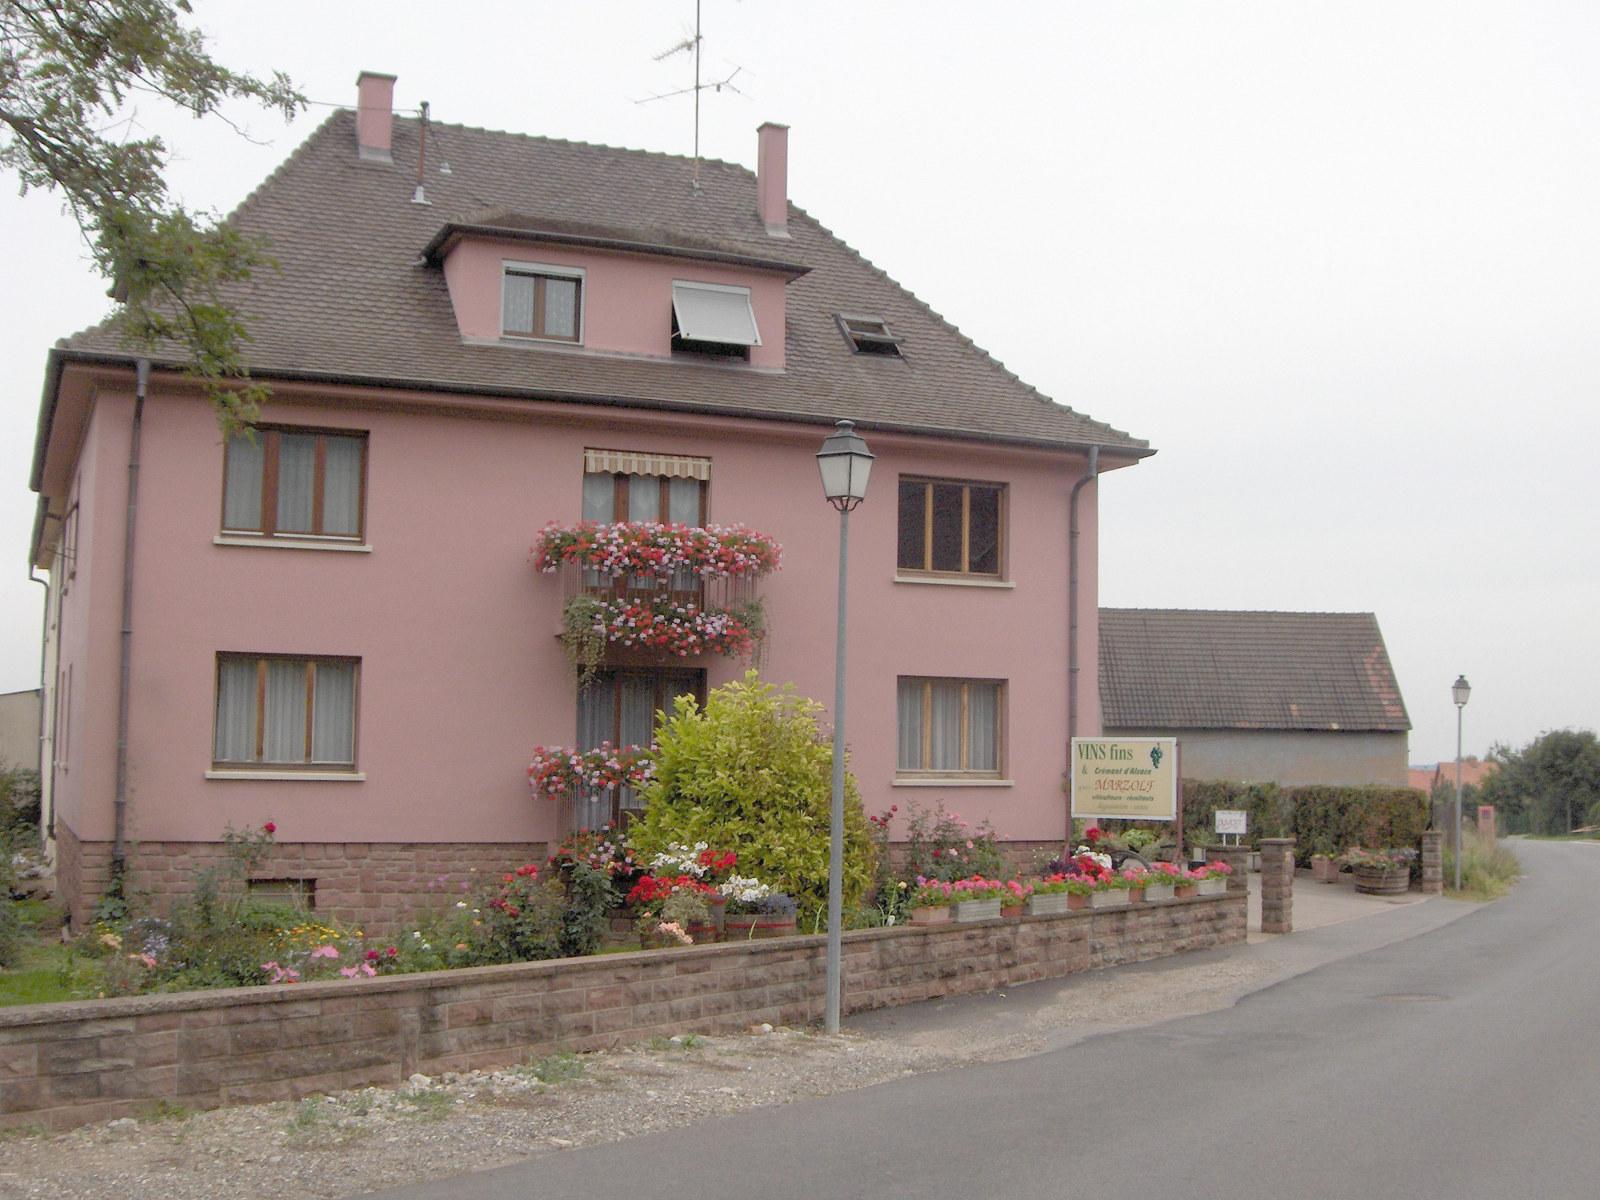 EARL Marzolf, Gueberschwihr, Pays de Rouffach, Vignobles et Châteaux, Haut-Rhin, Alsace